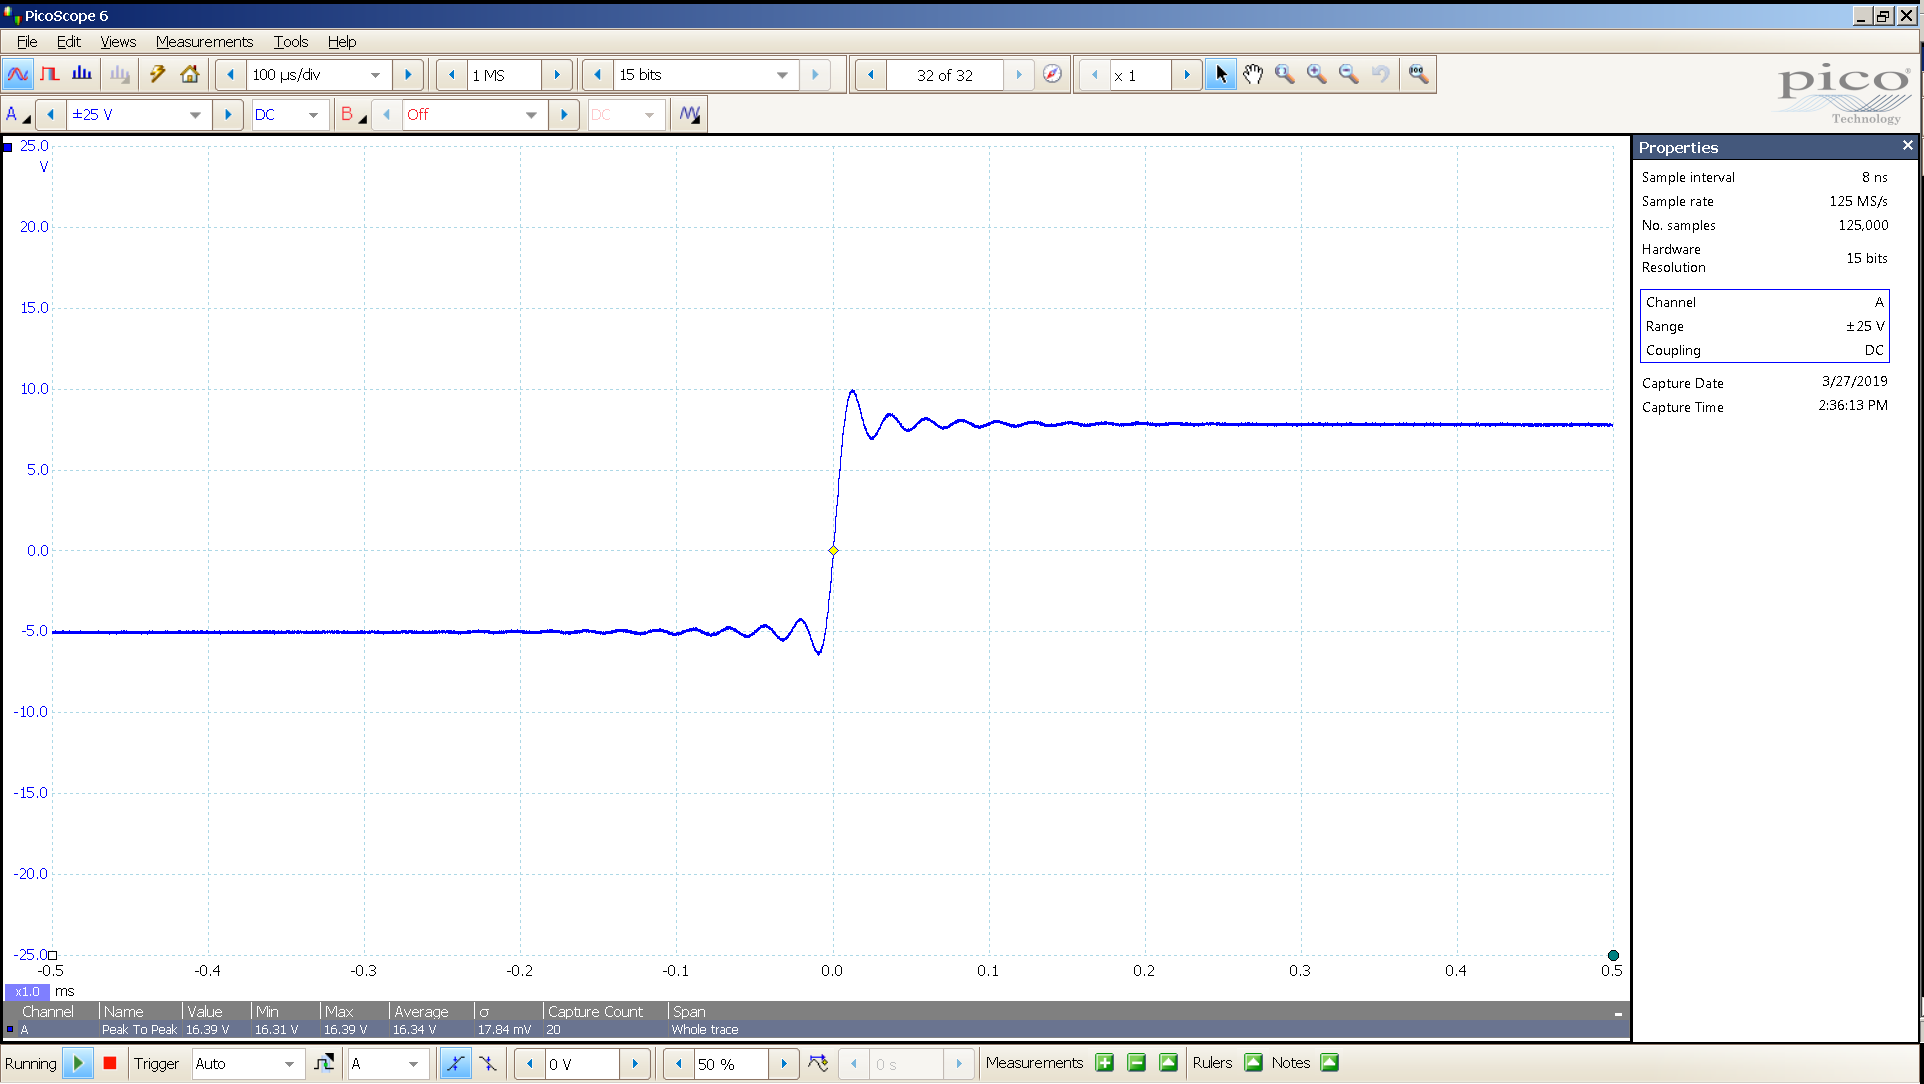 20190323-24 solaris Bal 20 Hz sqr -3 dBFS 16 Vpp 100uS div - AES 88K.PNG